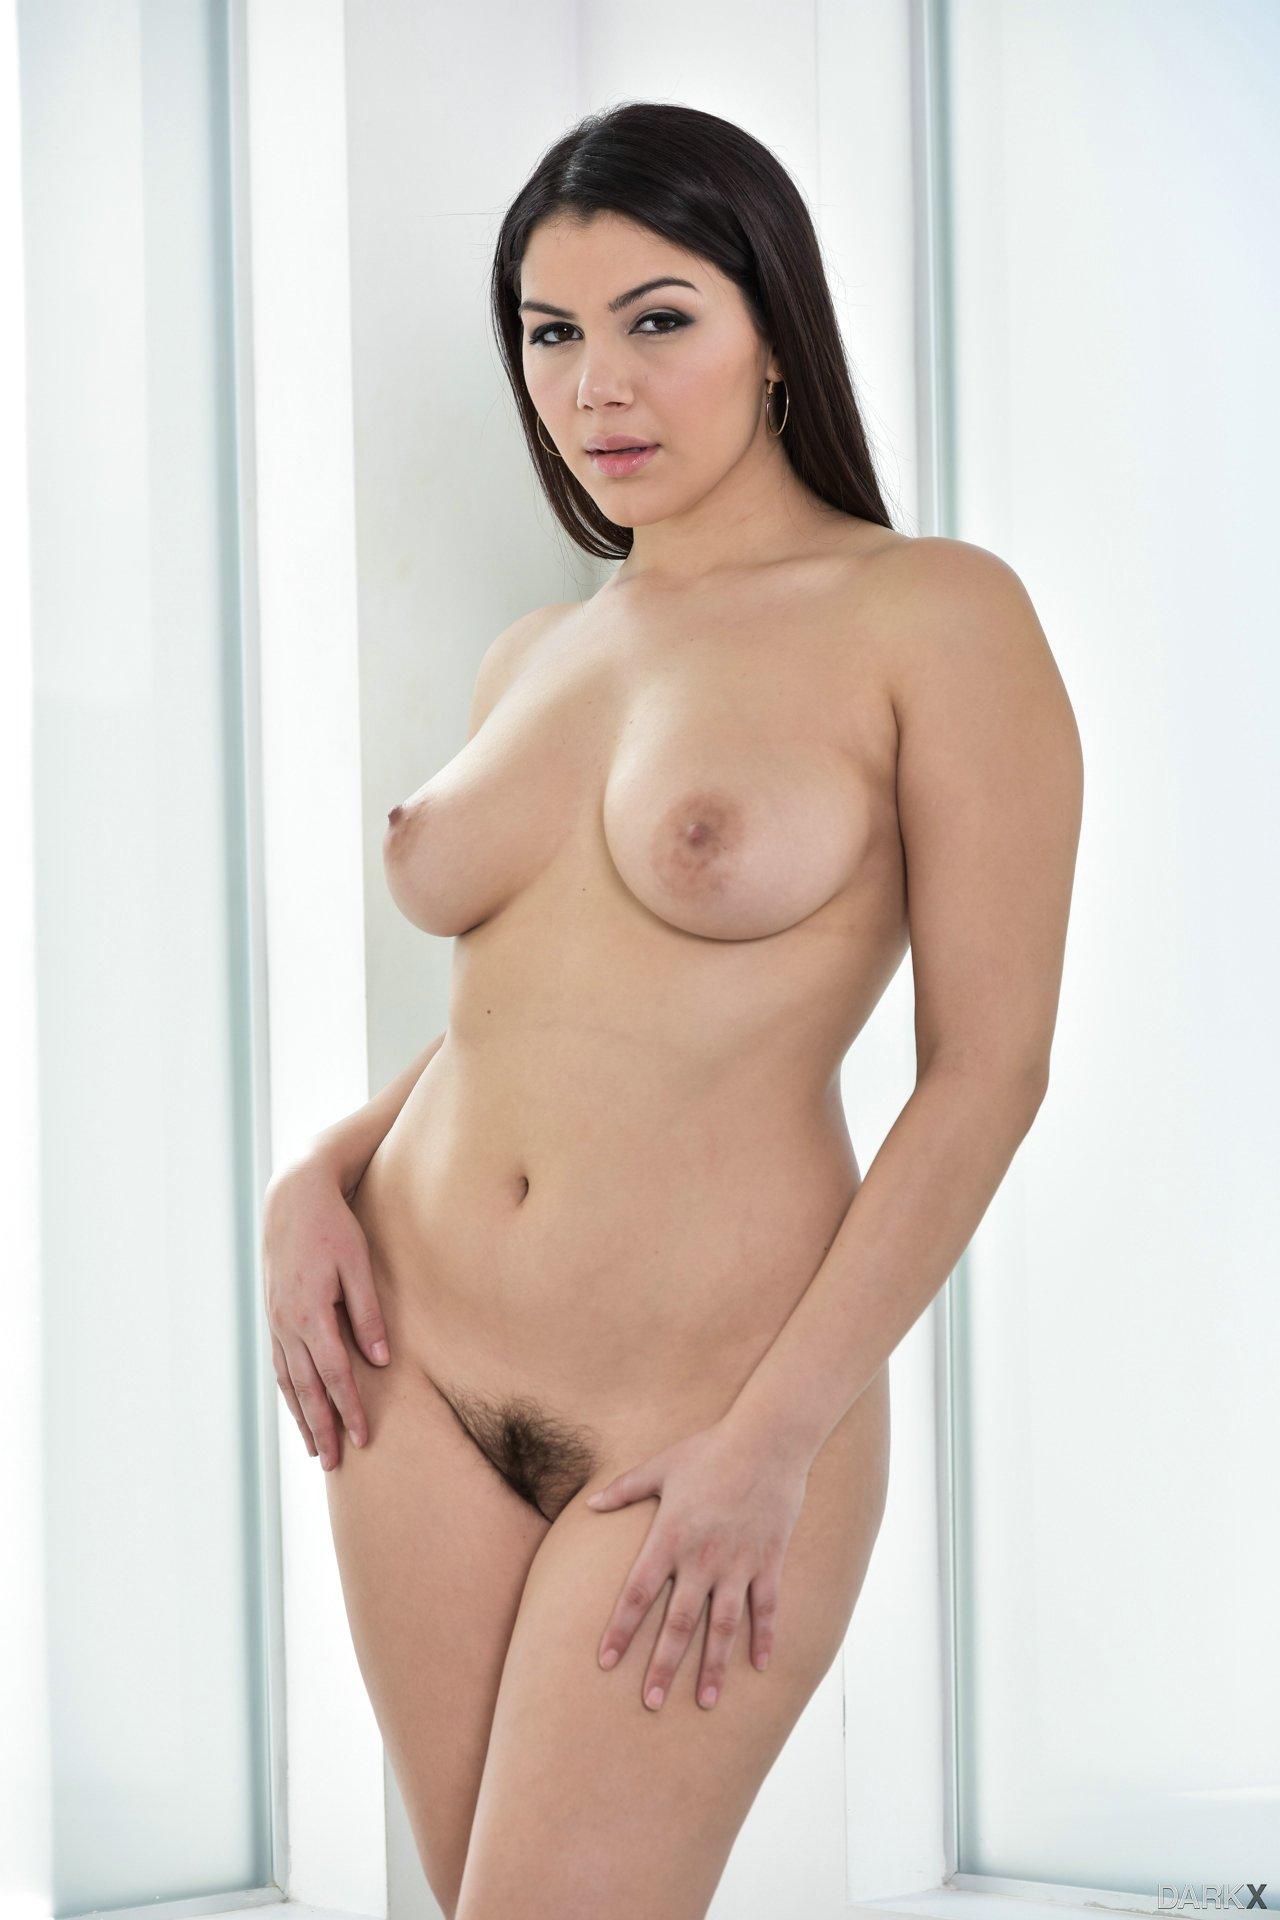 Valentina nappi foot and anal sex 6